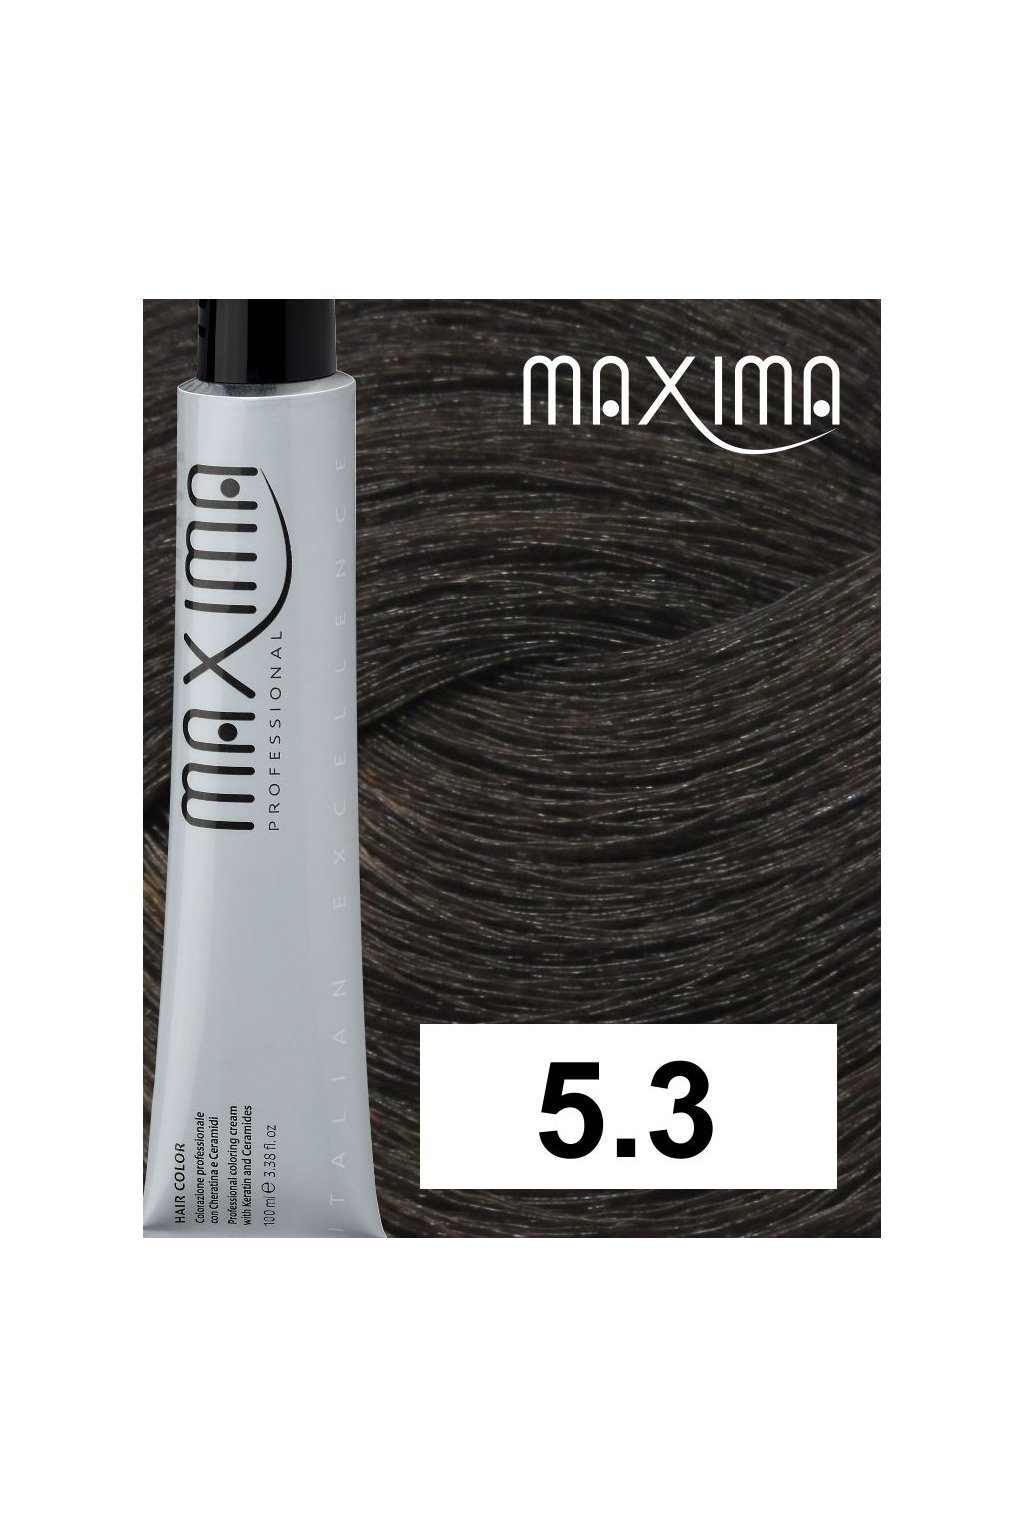 5 3 max